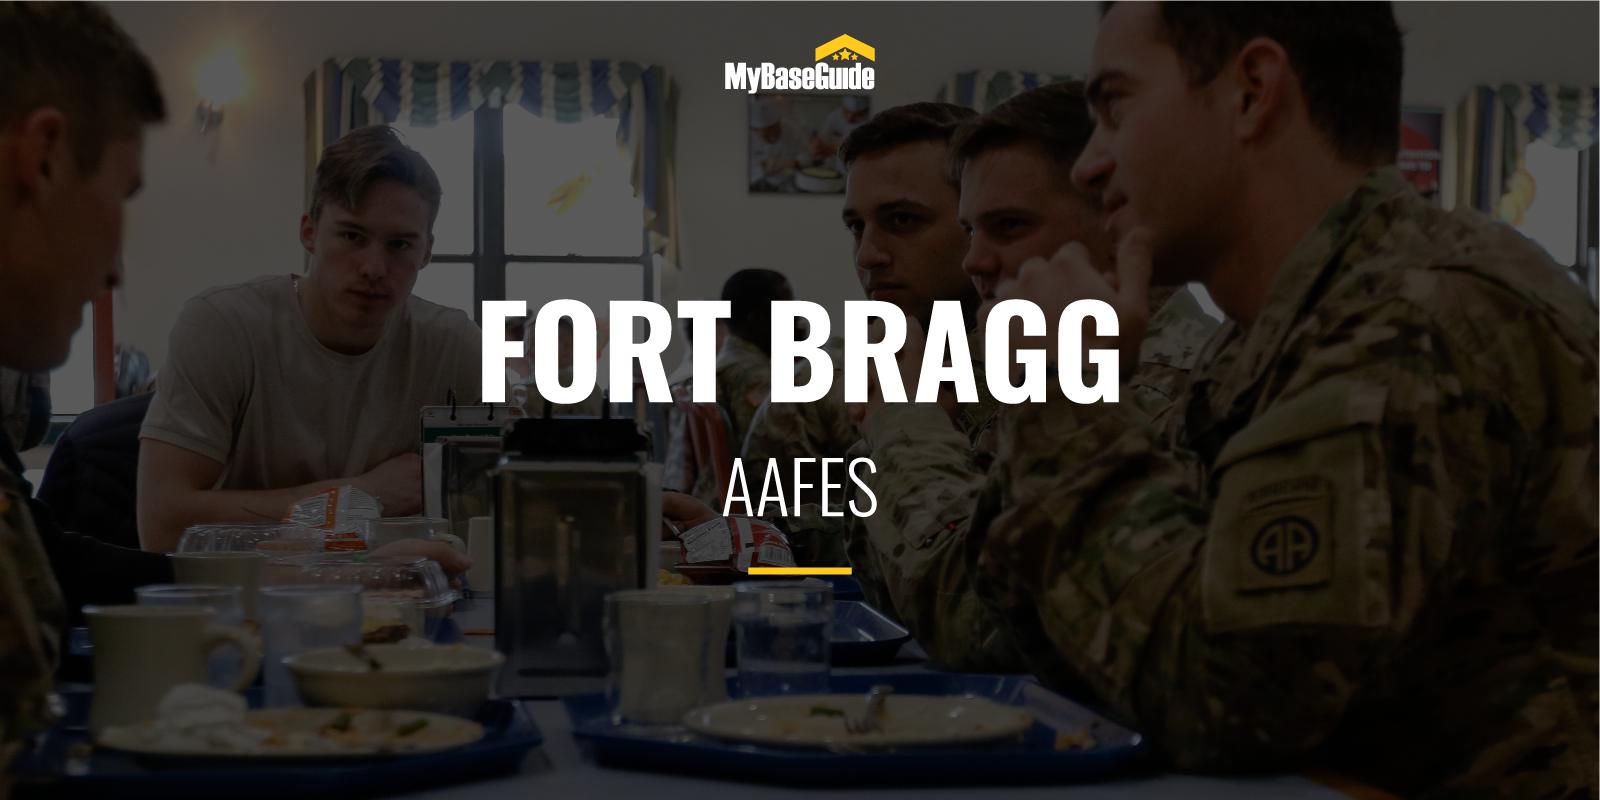 Fort Bragg AAFES